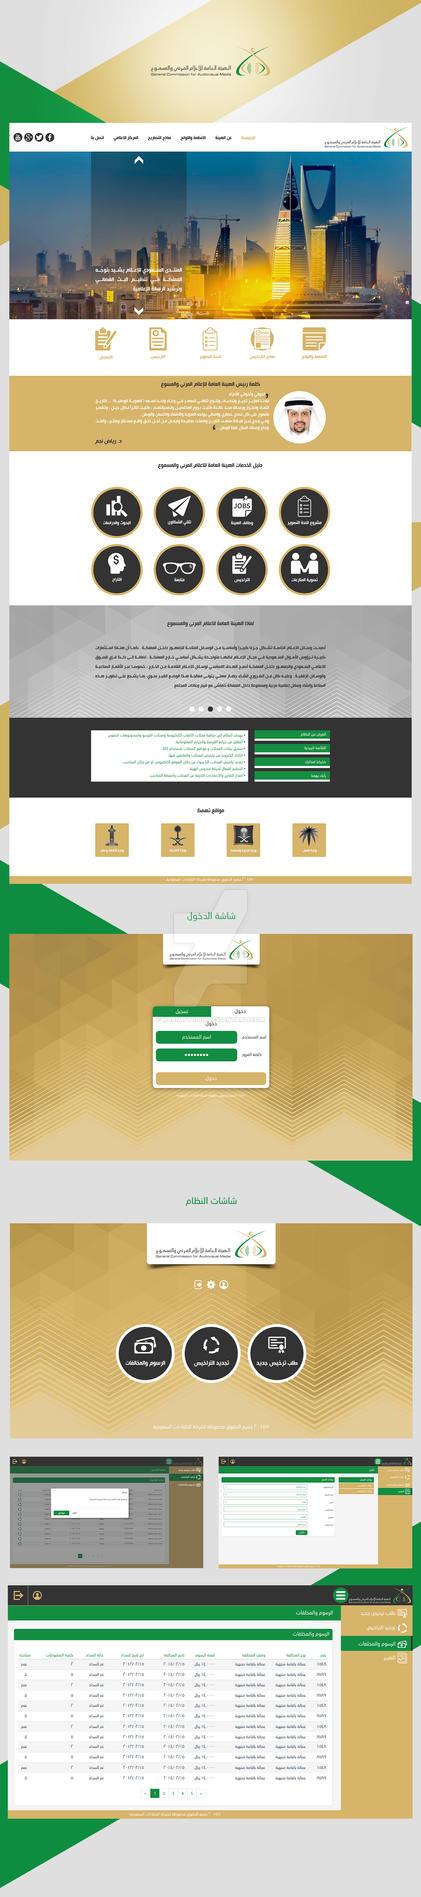 General Commission for Audiovisual Media | KSA by KarimStudio